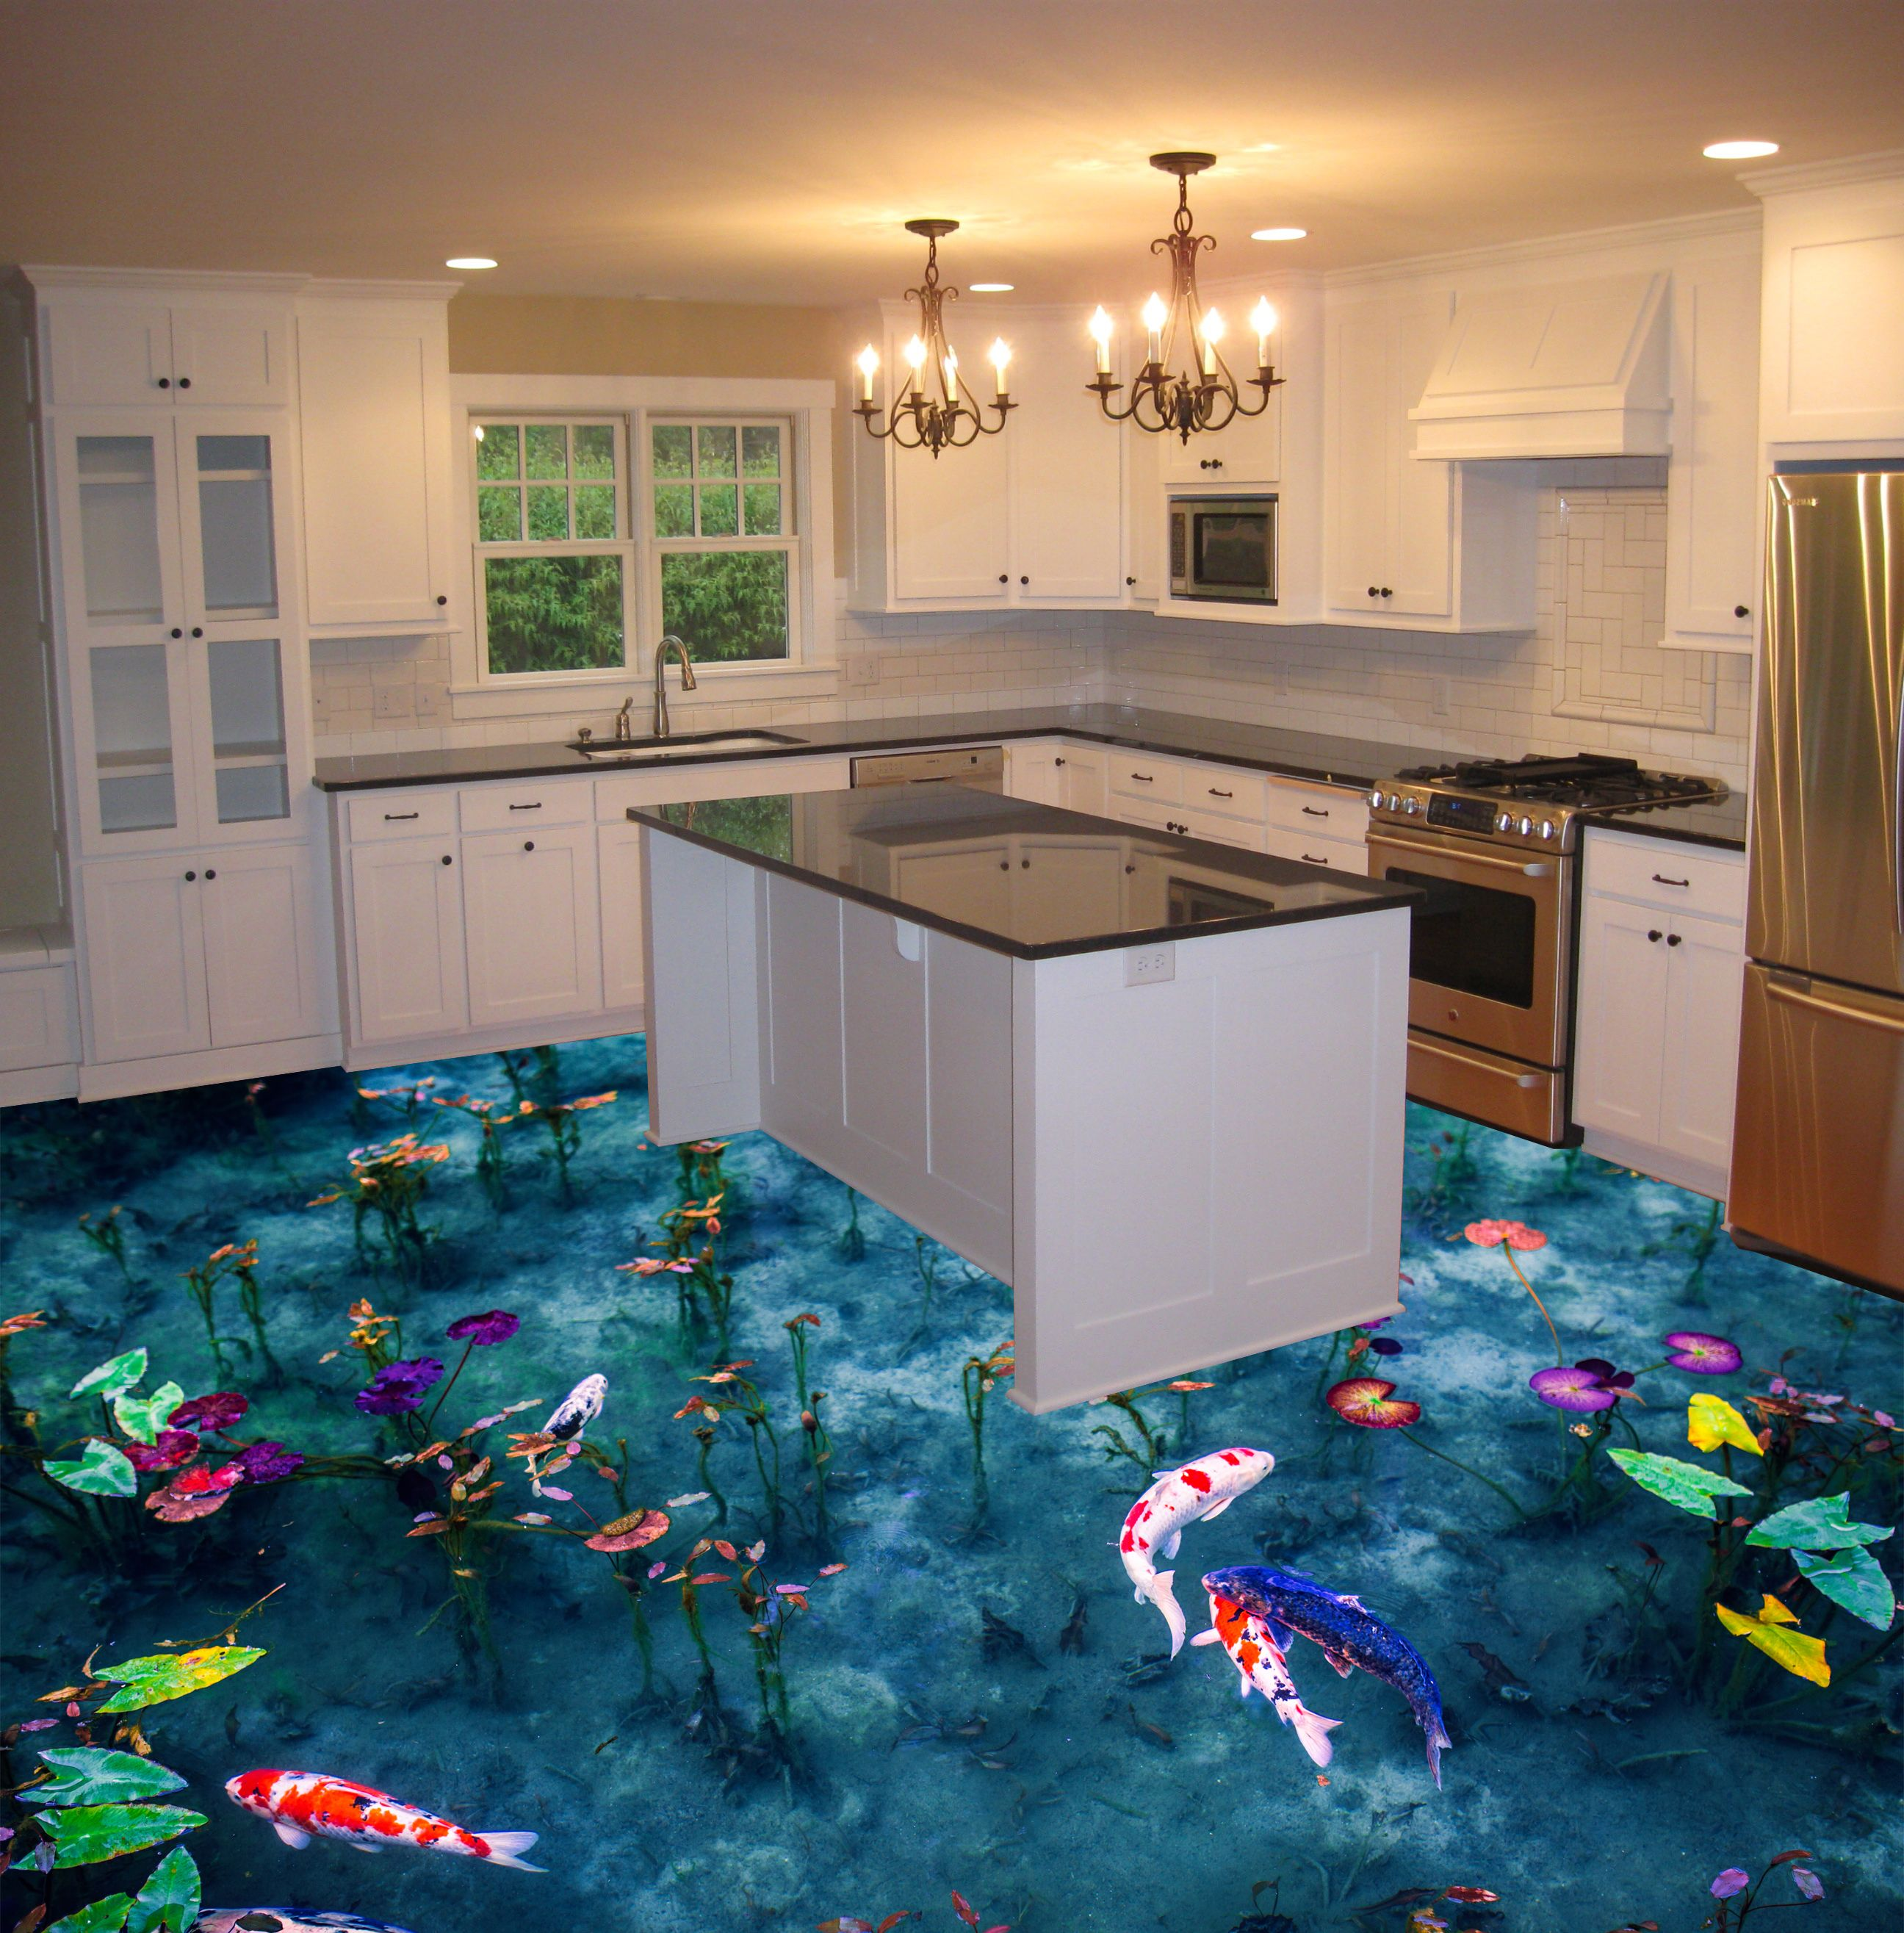 3d epoxy flooring for kitchen koi fish pond theme Epoxy